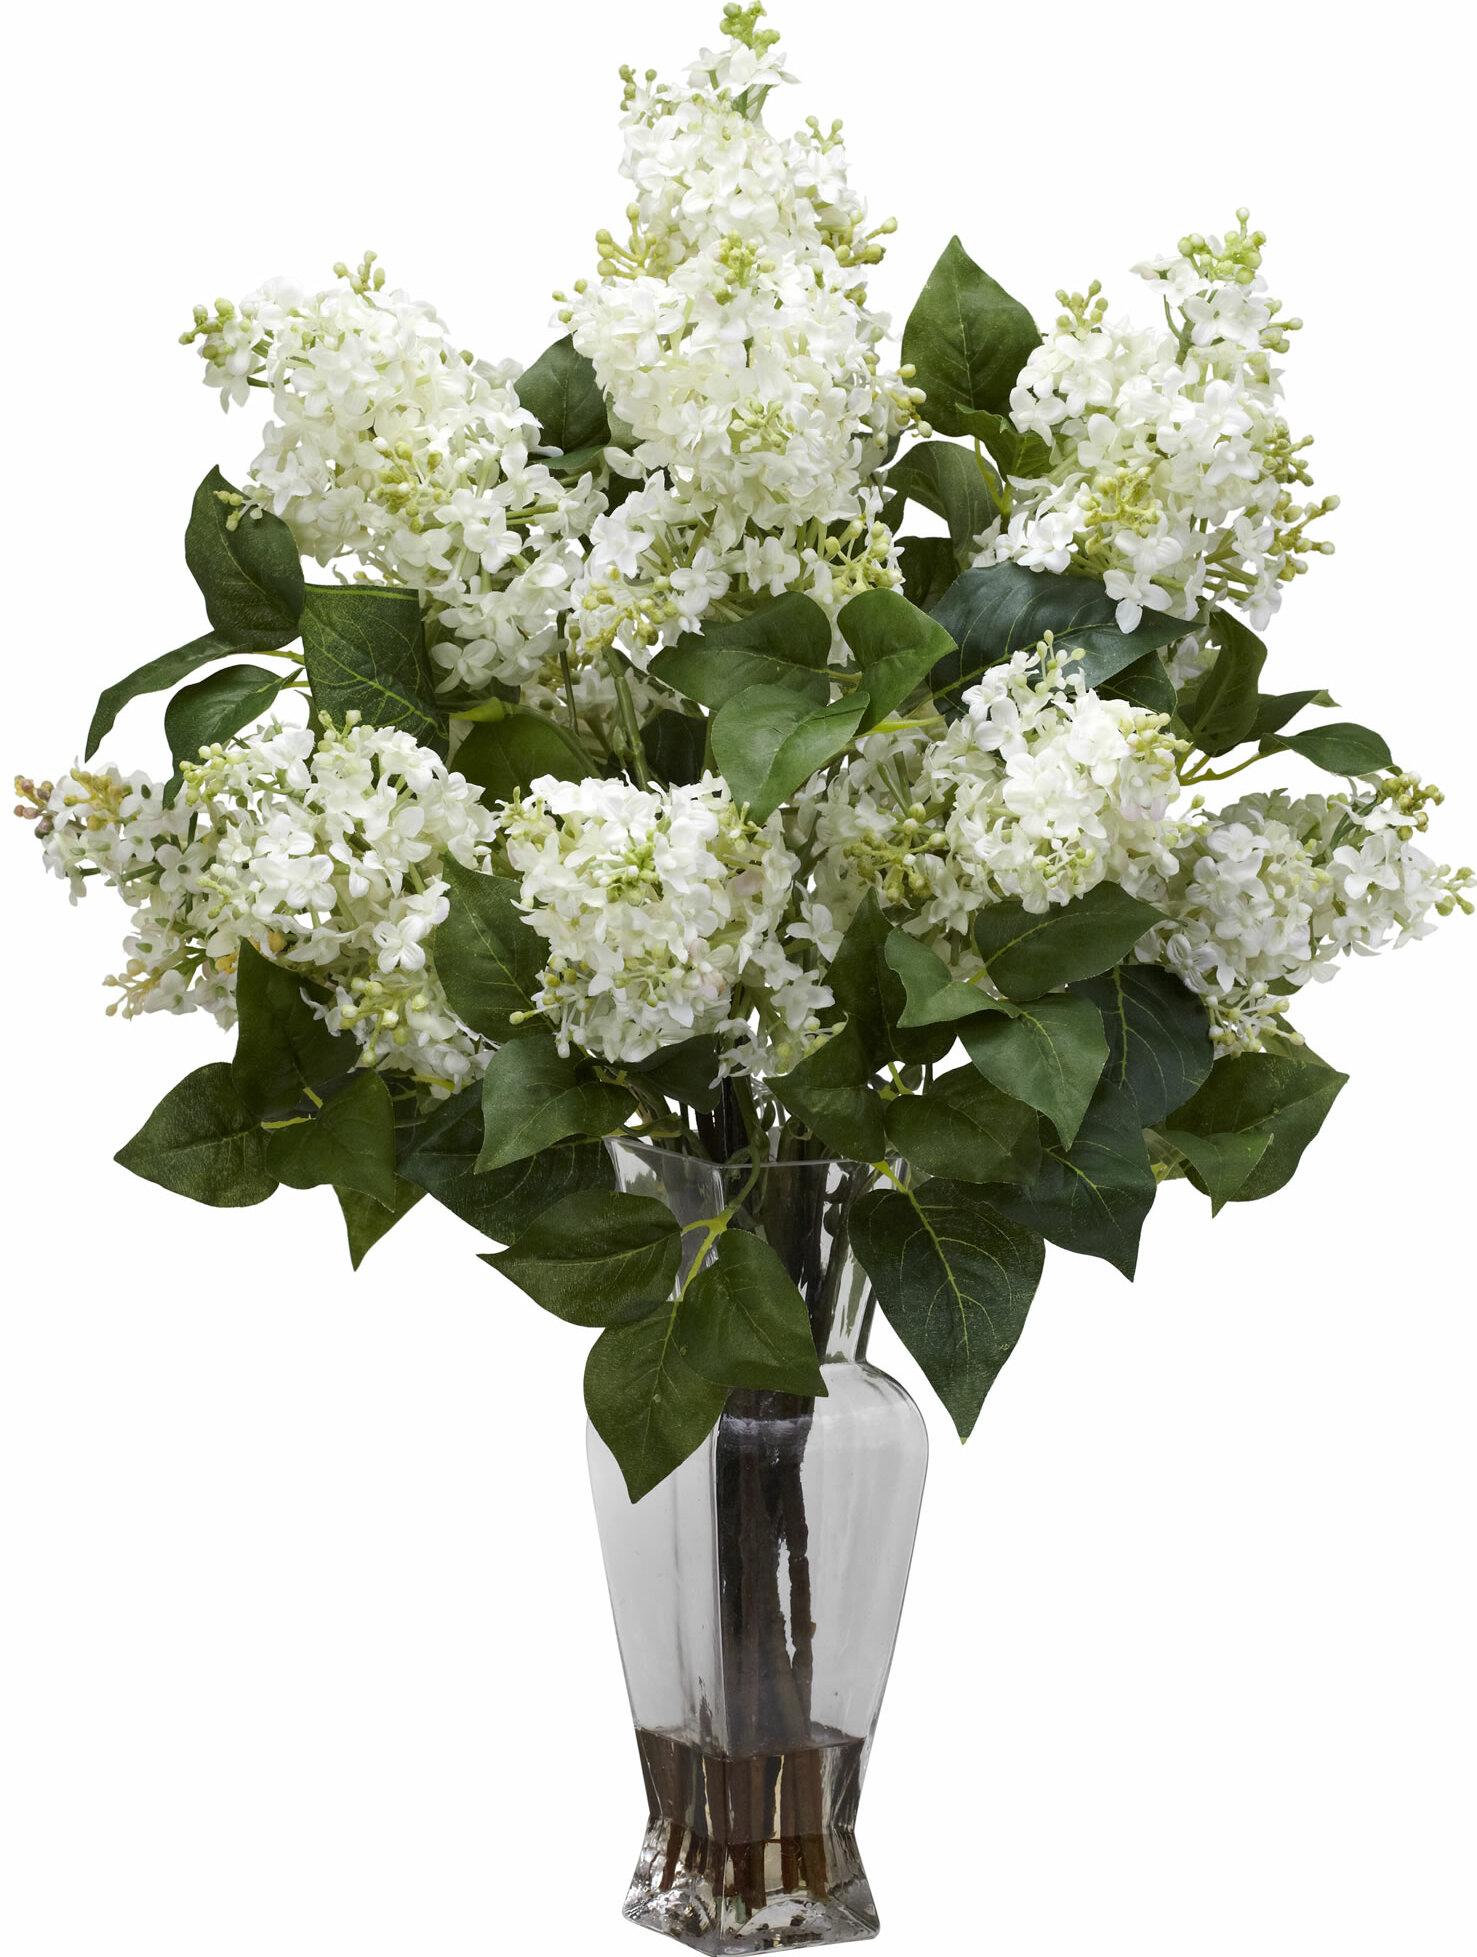 Lilac Silk Flower Arrangement With Decorative Vase